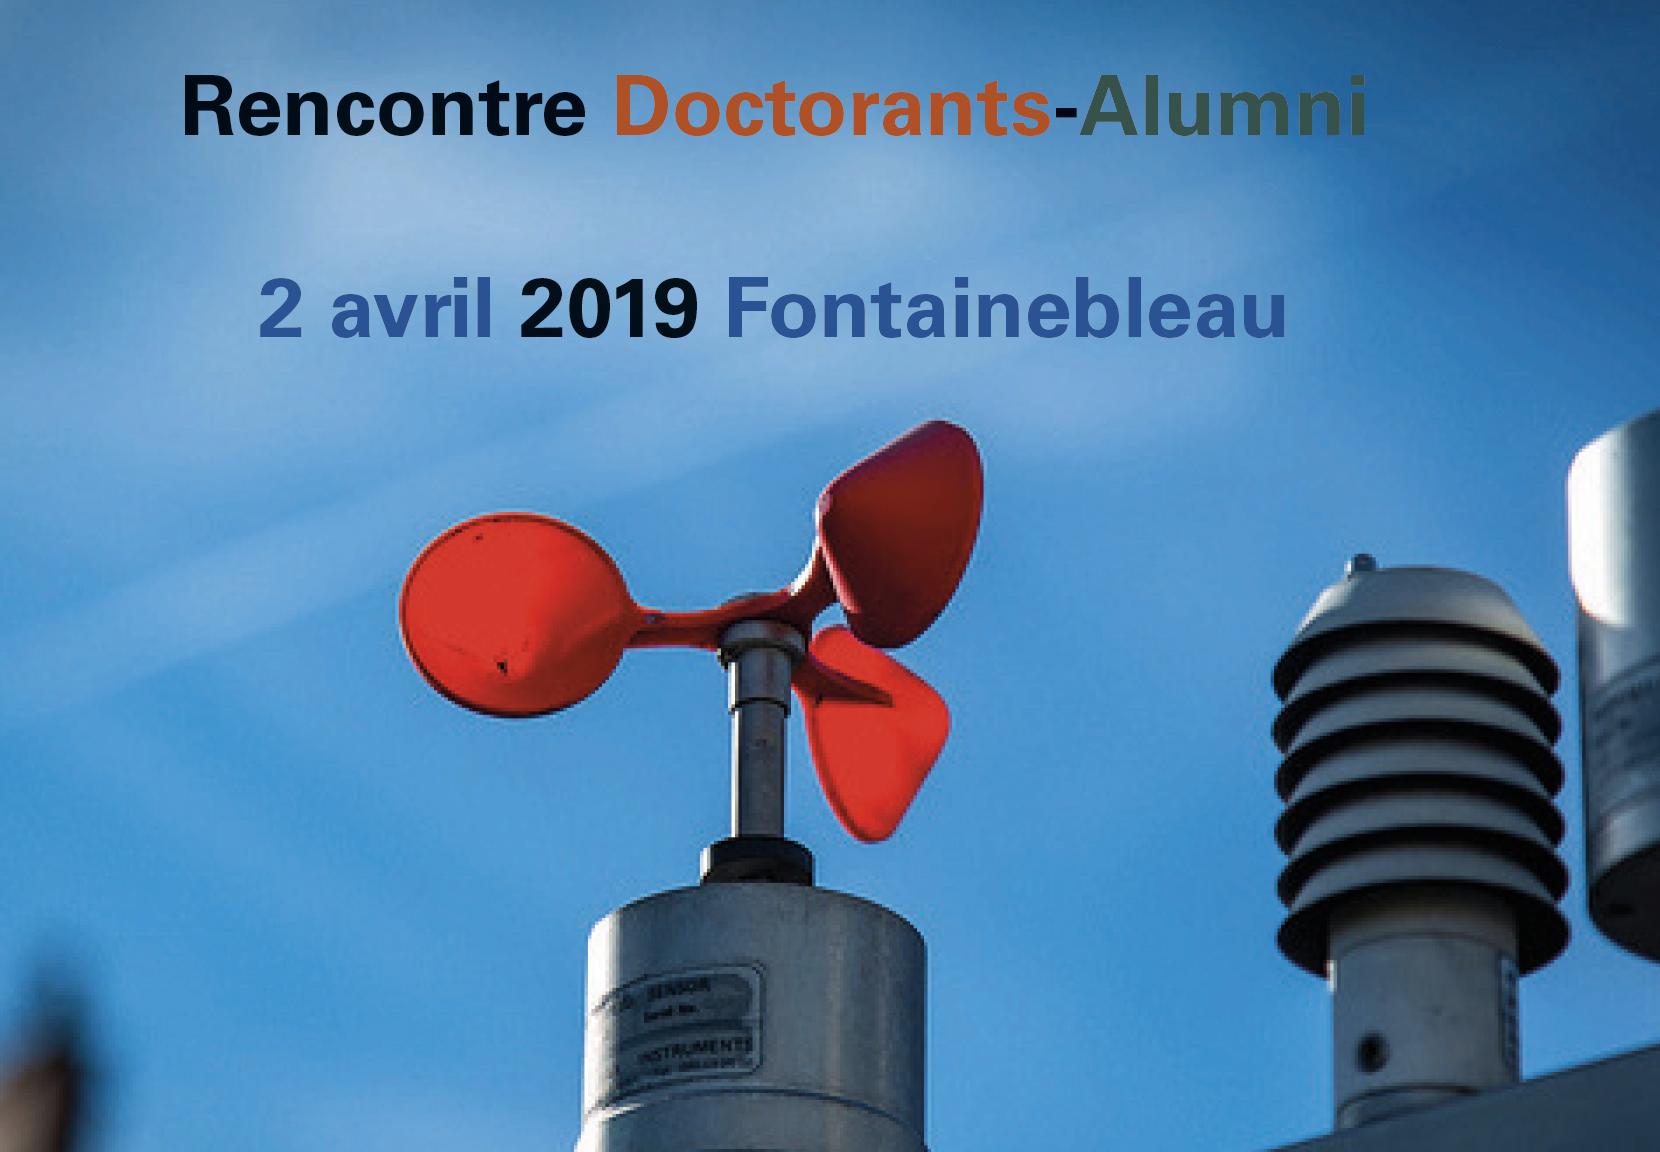 Rencontre Doctorants-Alumni